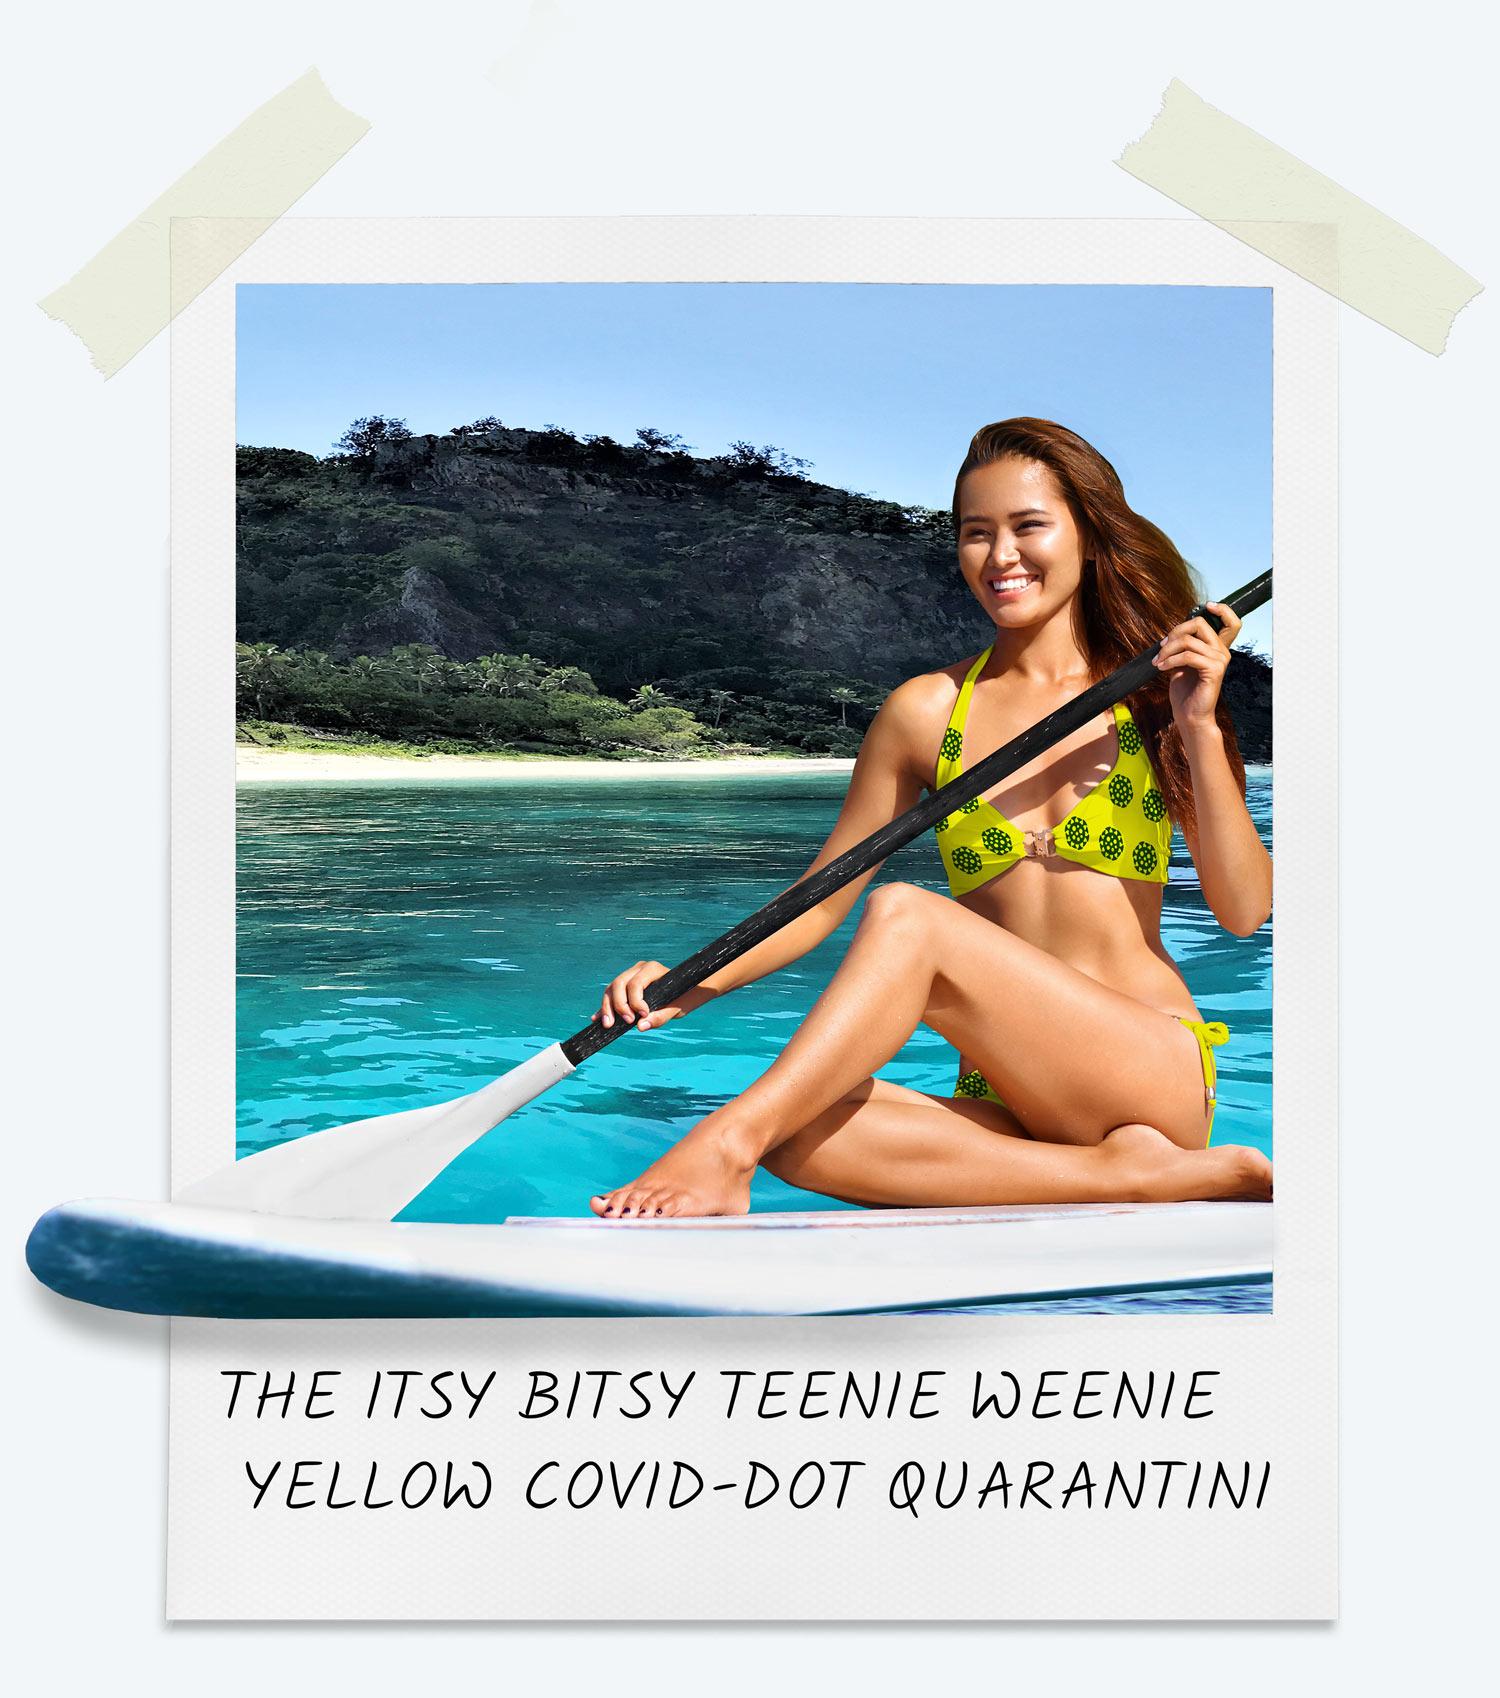 A woman wearing our Itsy Bitsy Teenie Weenie Yellow Covid-Dot Quarantini.